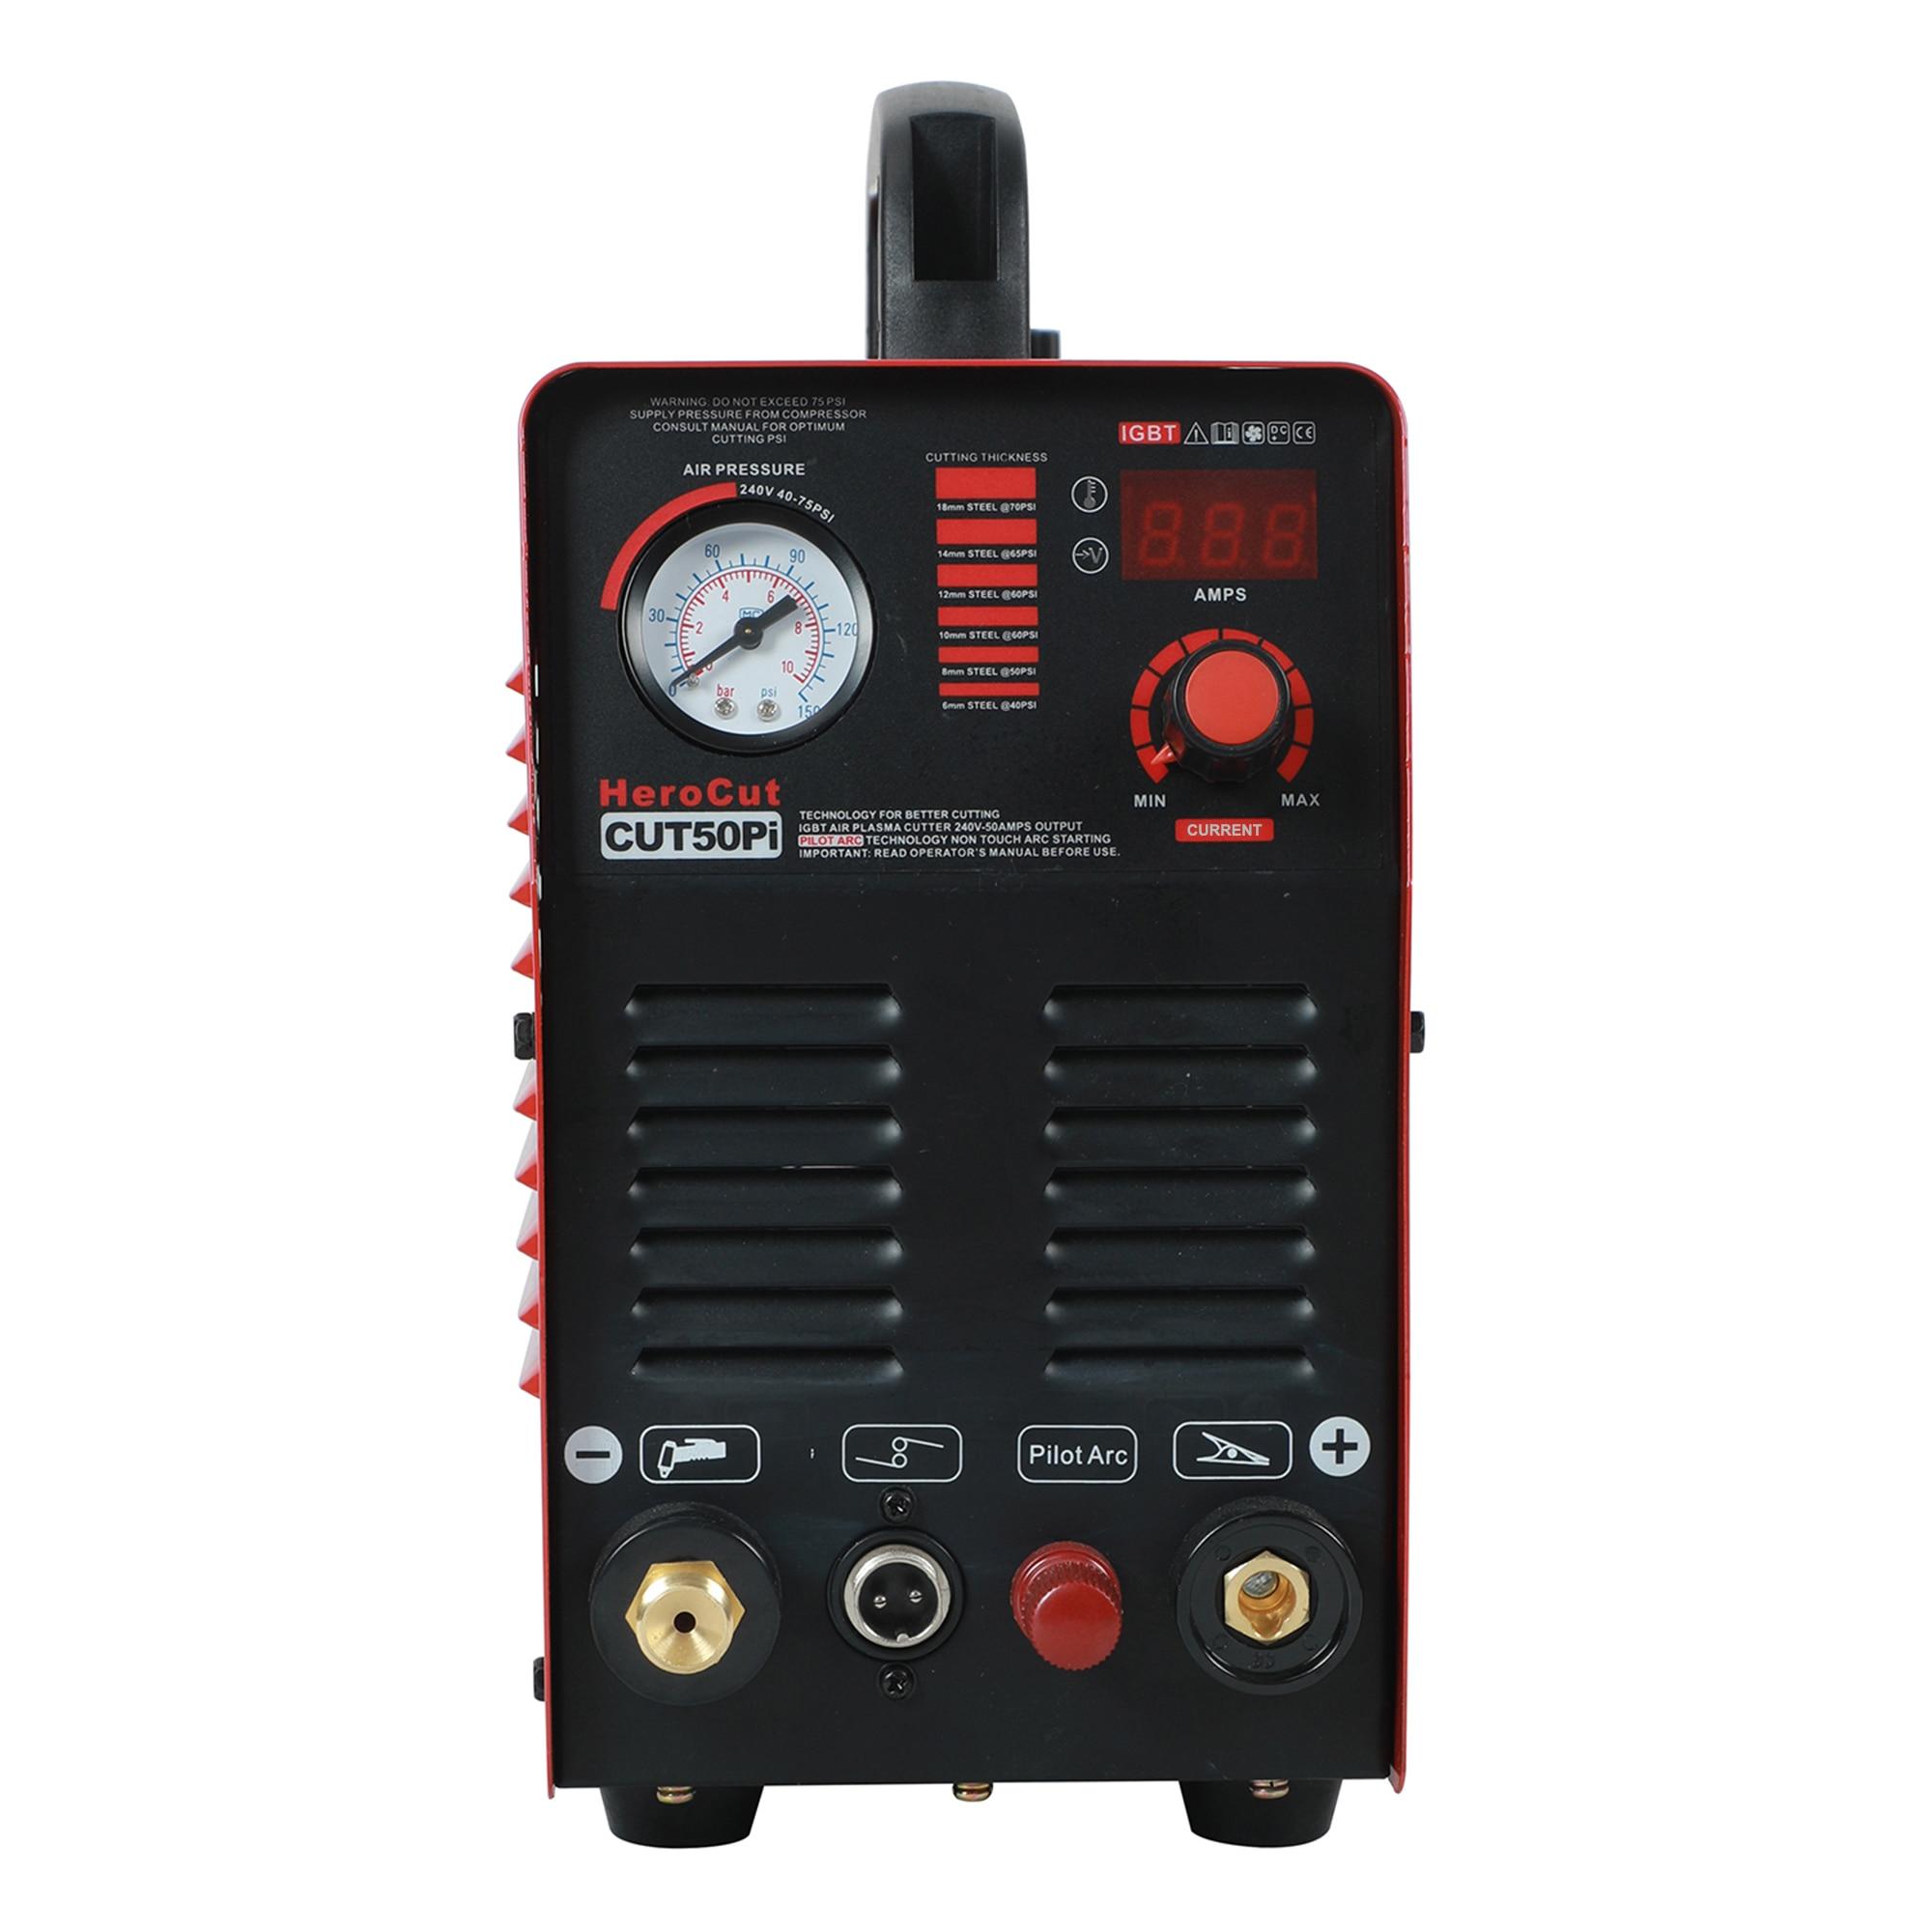 Tools : CUT50Pi IGBT Pilot Arc HF 50Amps DC Air Plasma cutting machine 220V plasma Cutter clean cutting thickness 15mm